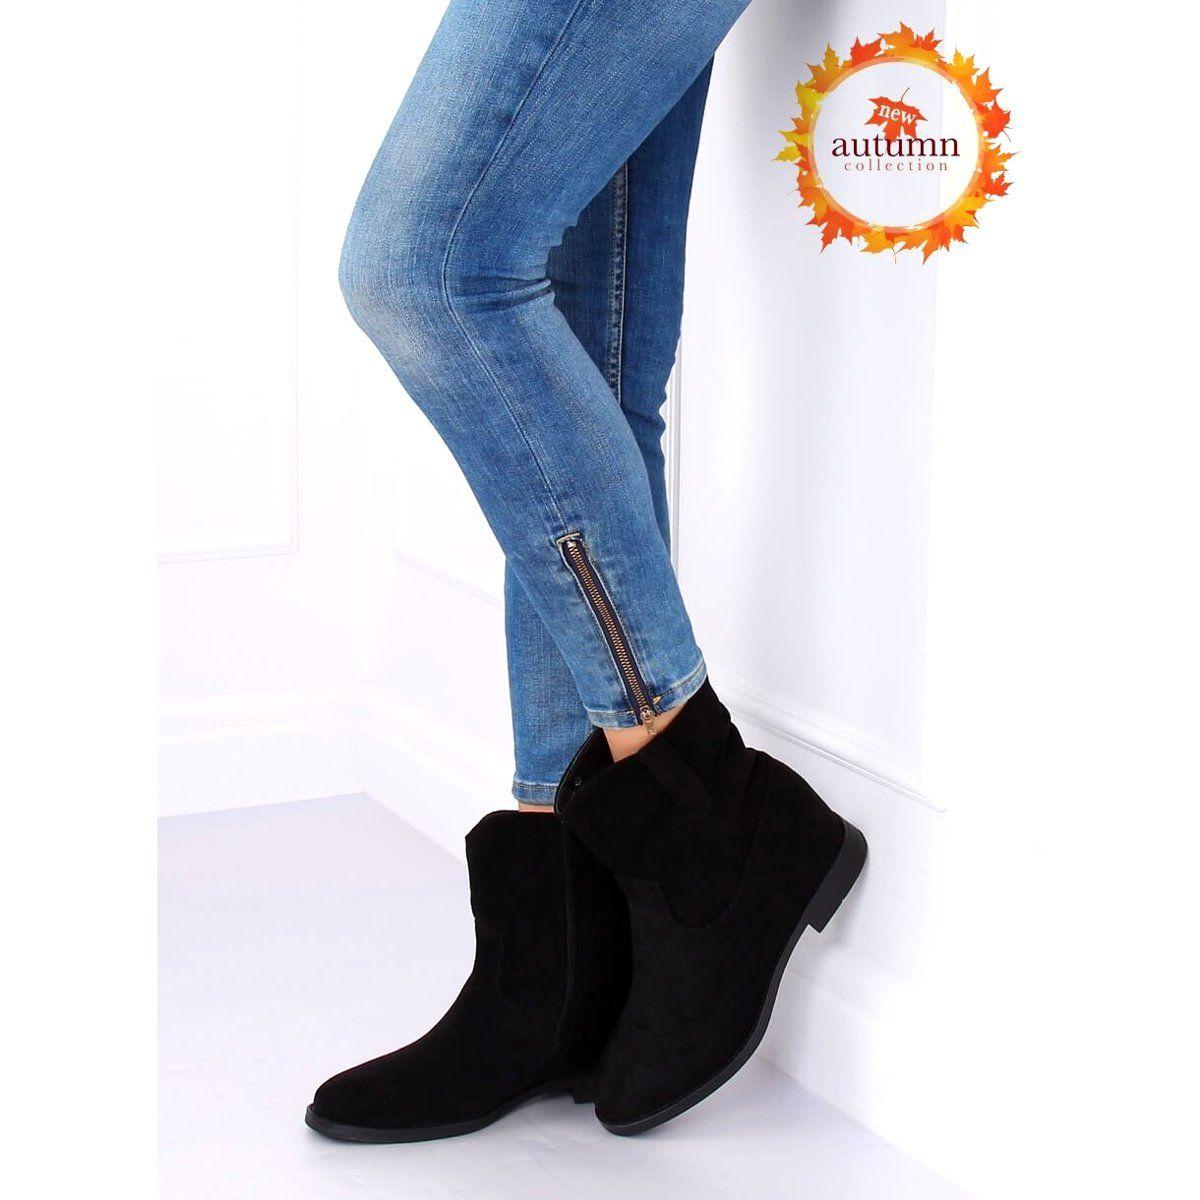 Botki Na Ukrytym Koturnie Czarne Nc980 Black Black Boots Boots Boot Shoes Women